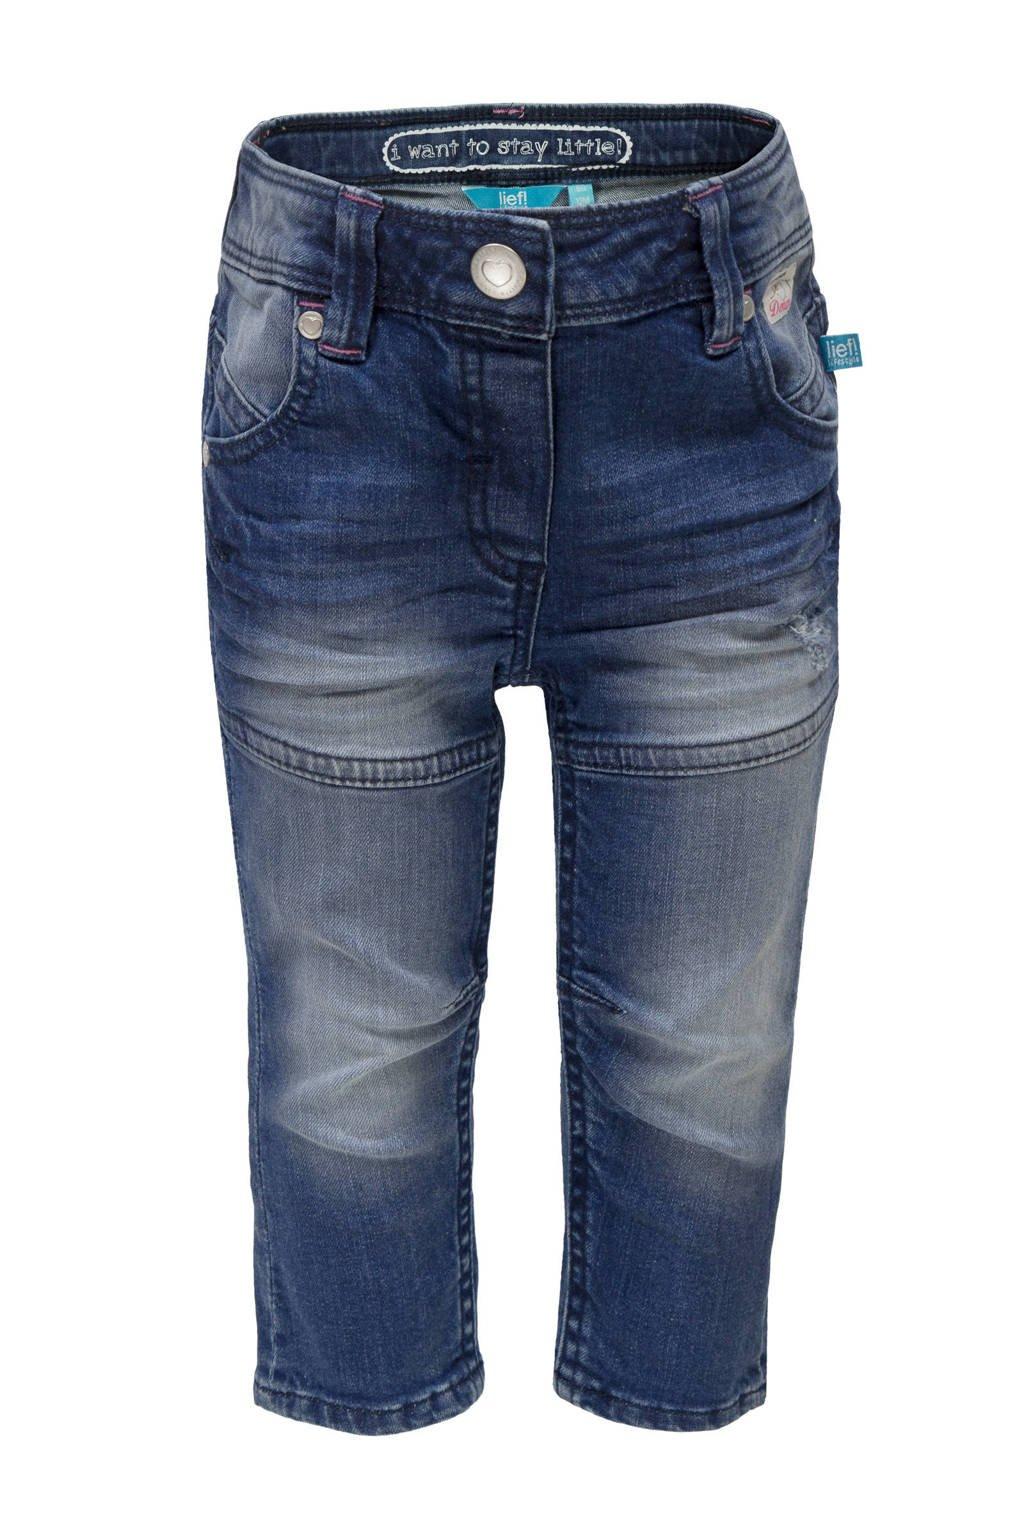 lief! jeans donkerblauw, Donkerblauw